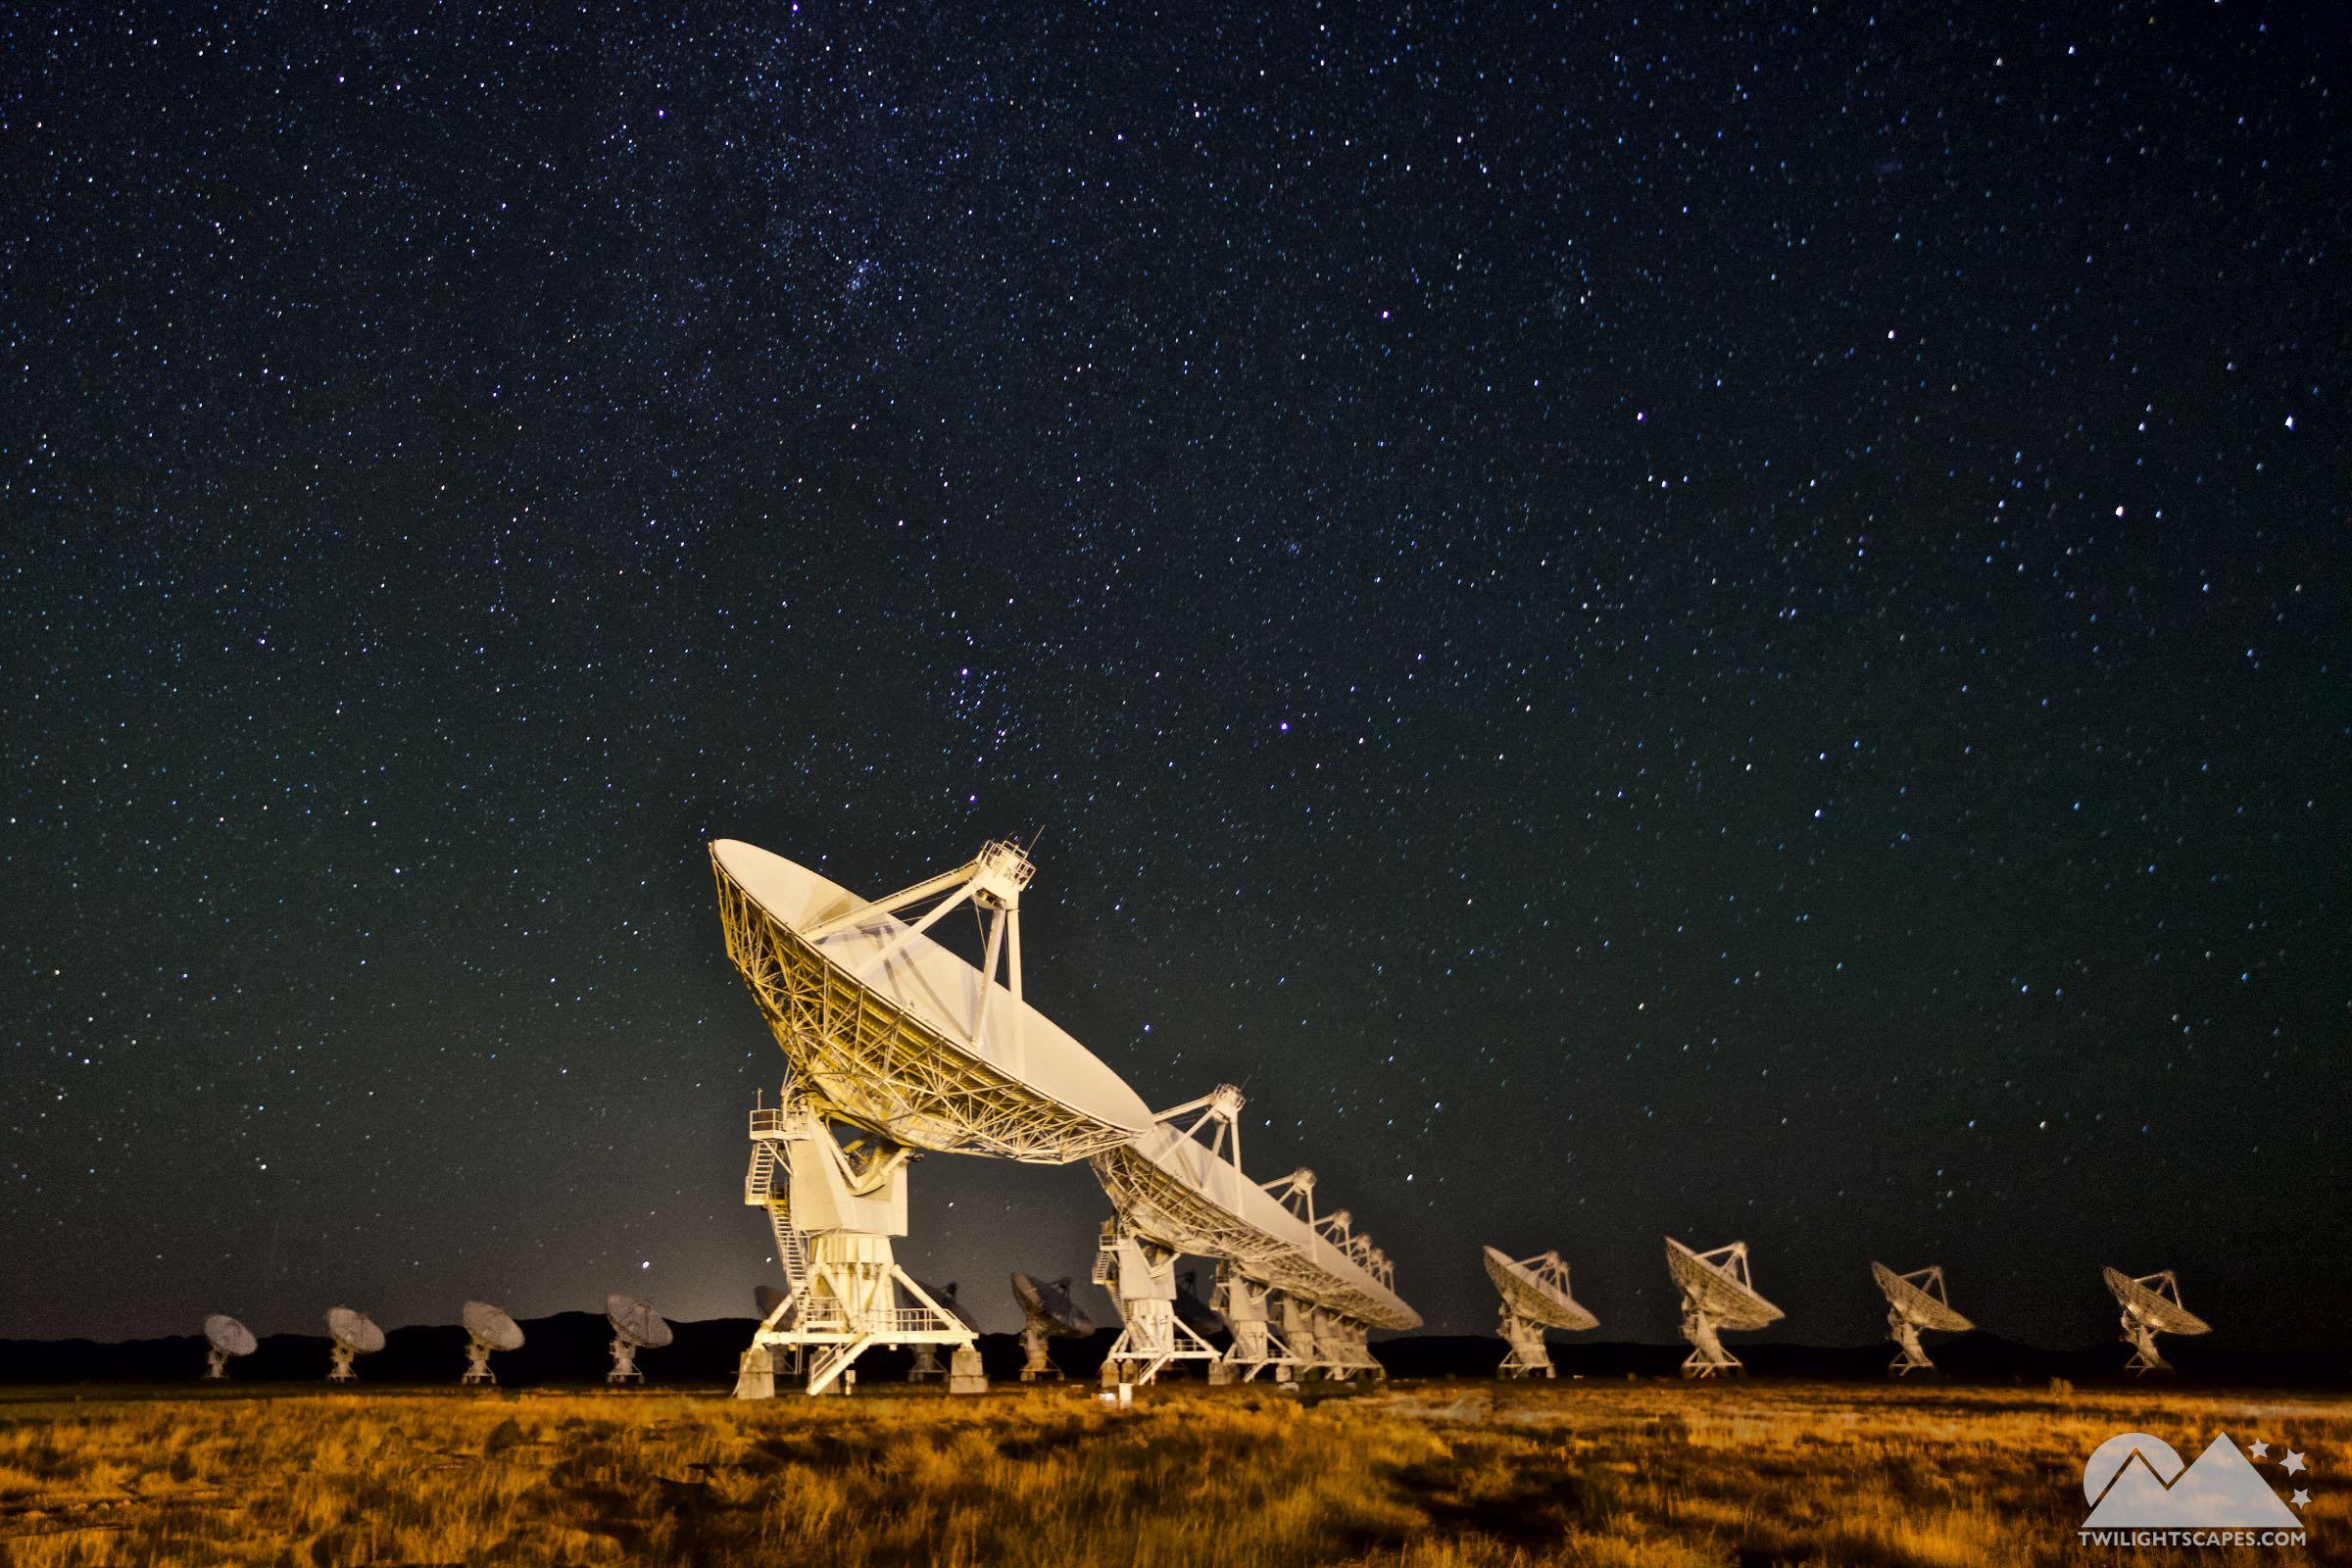 Stellar Sentries